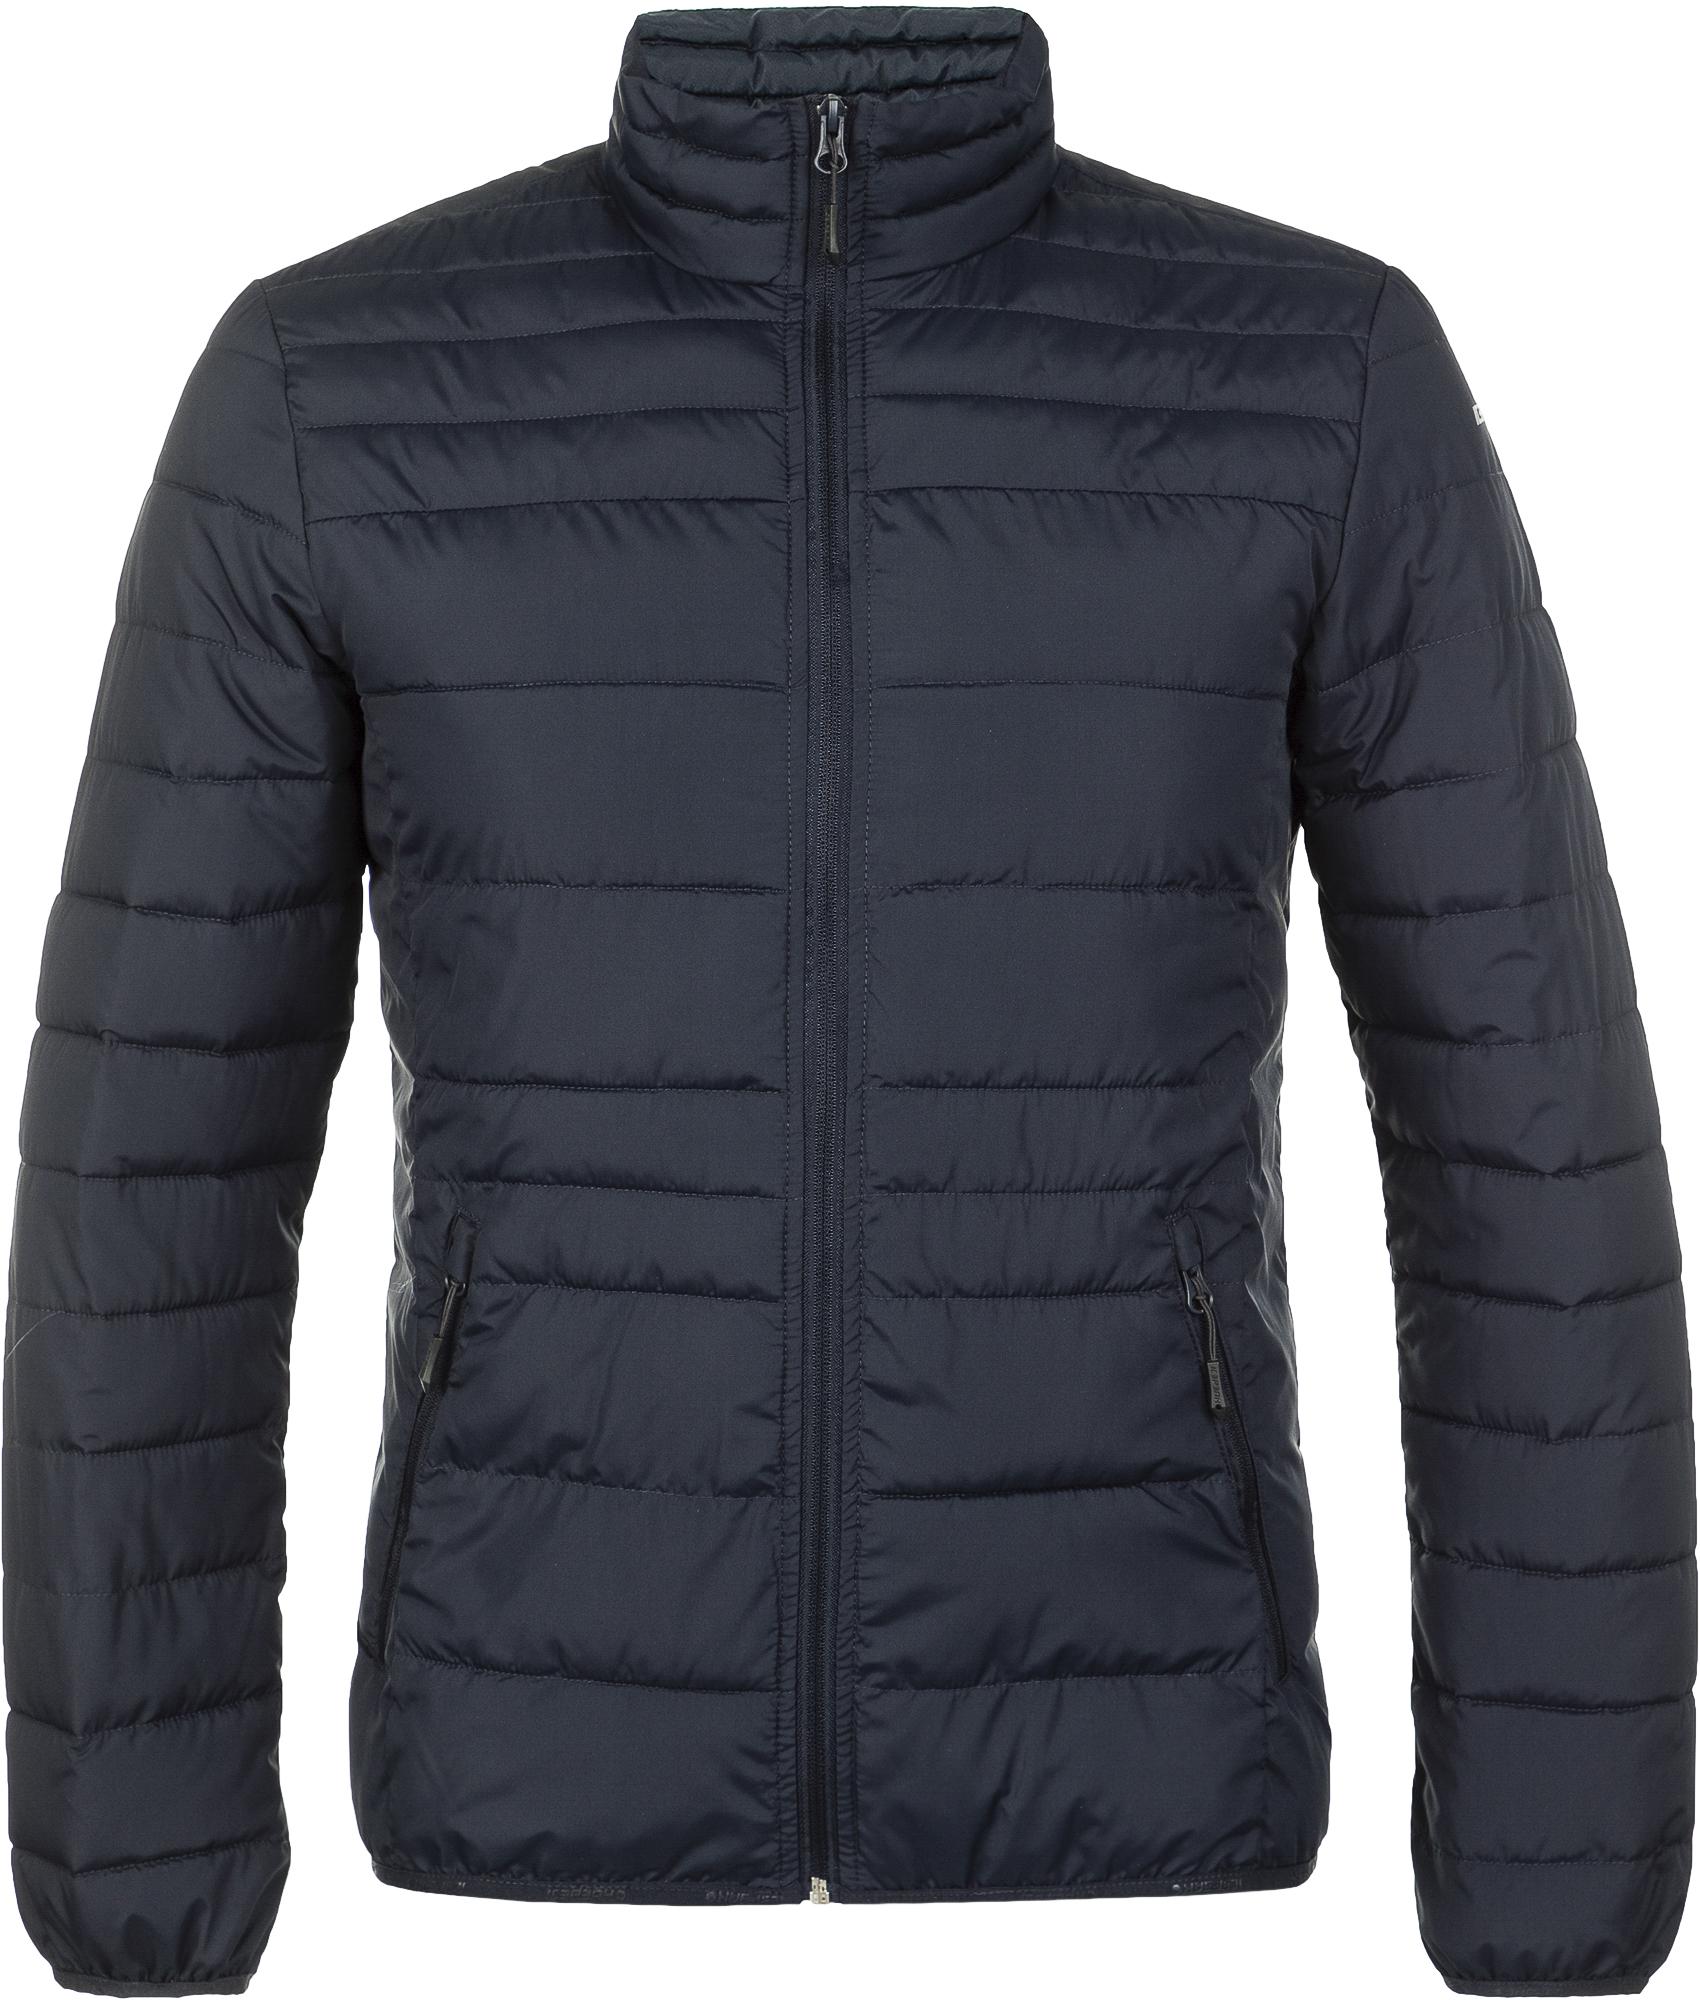 IcePeak Куртка утепленная мужская IcePeak Vannes, размер 54